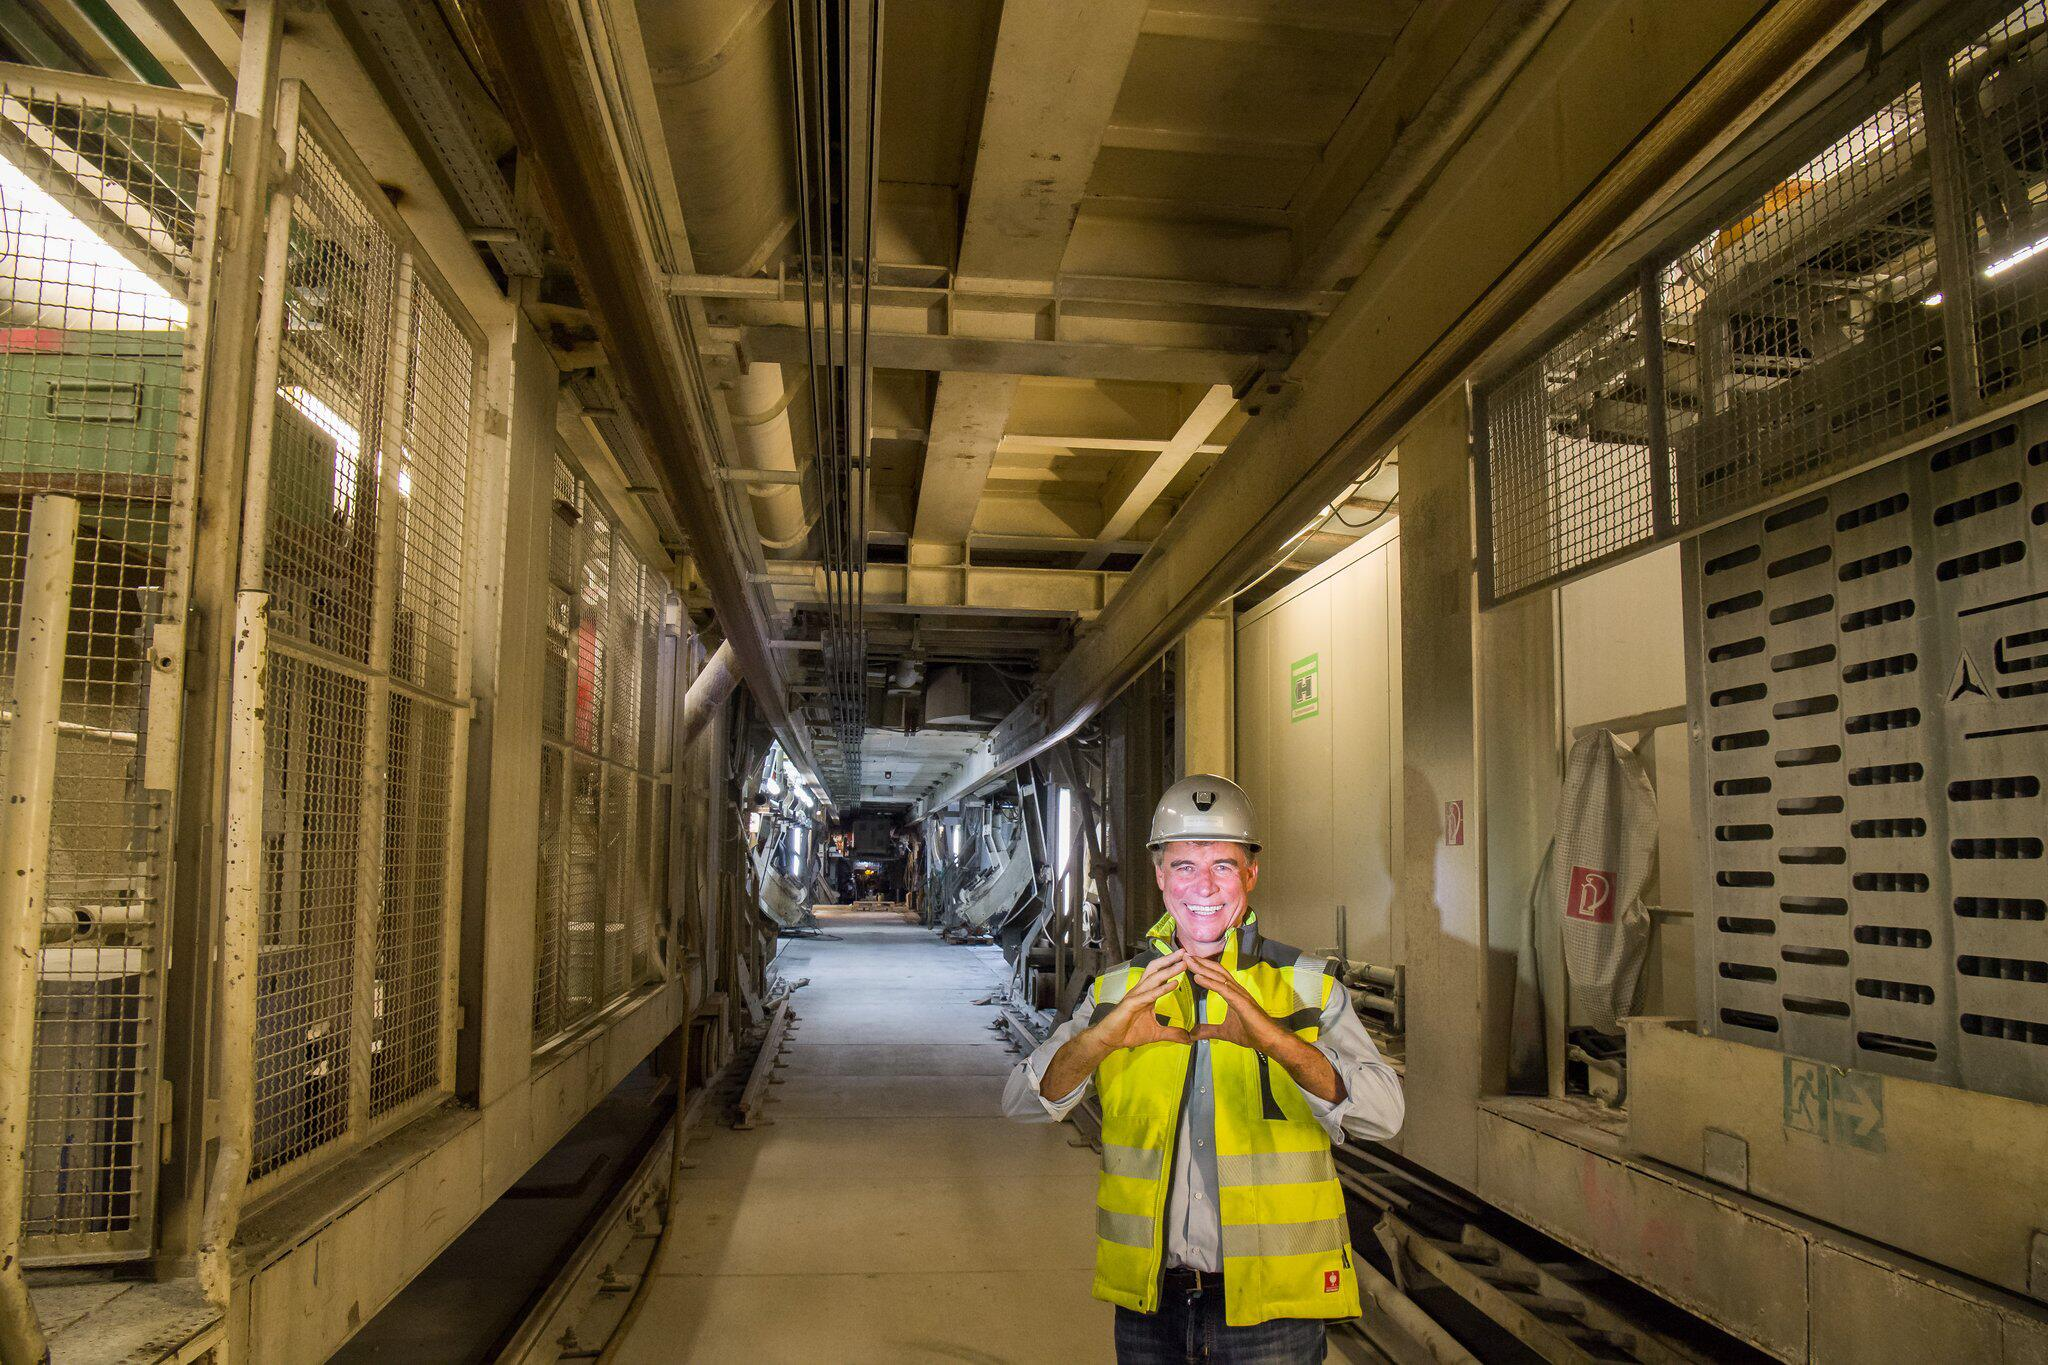 Bild zu Brenner Basistunnel, Konrad Bergmeister